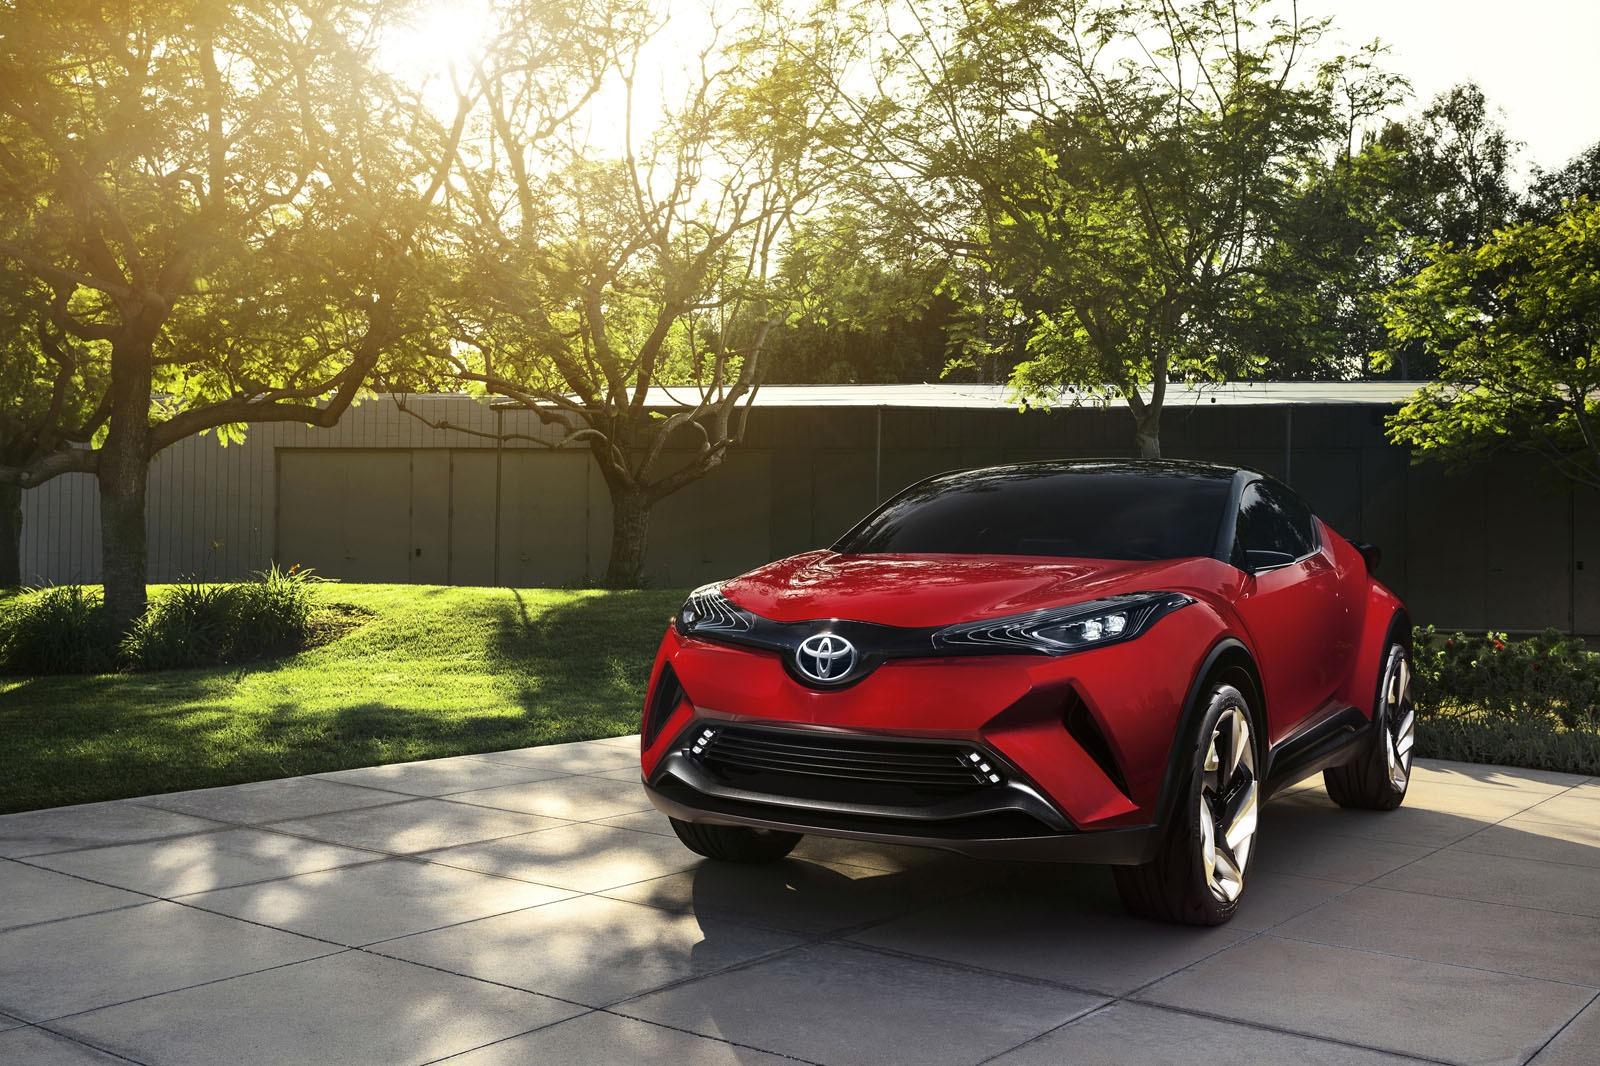 2018 Toyota C-HR Review, Price, Specs, Interior, Pictures ...